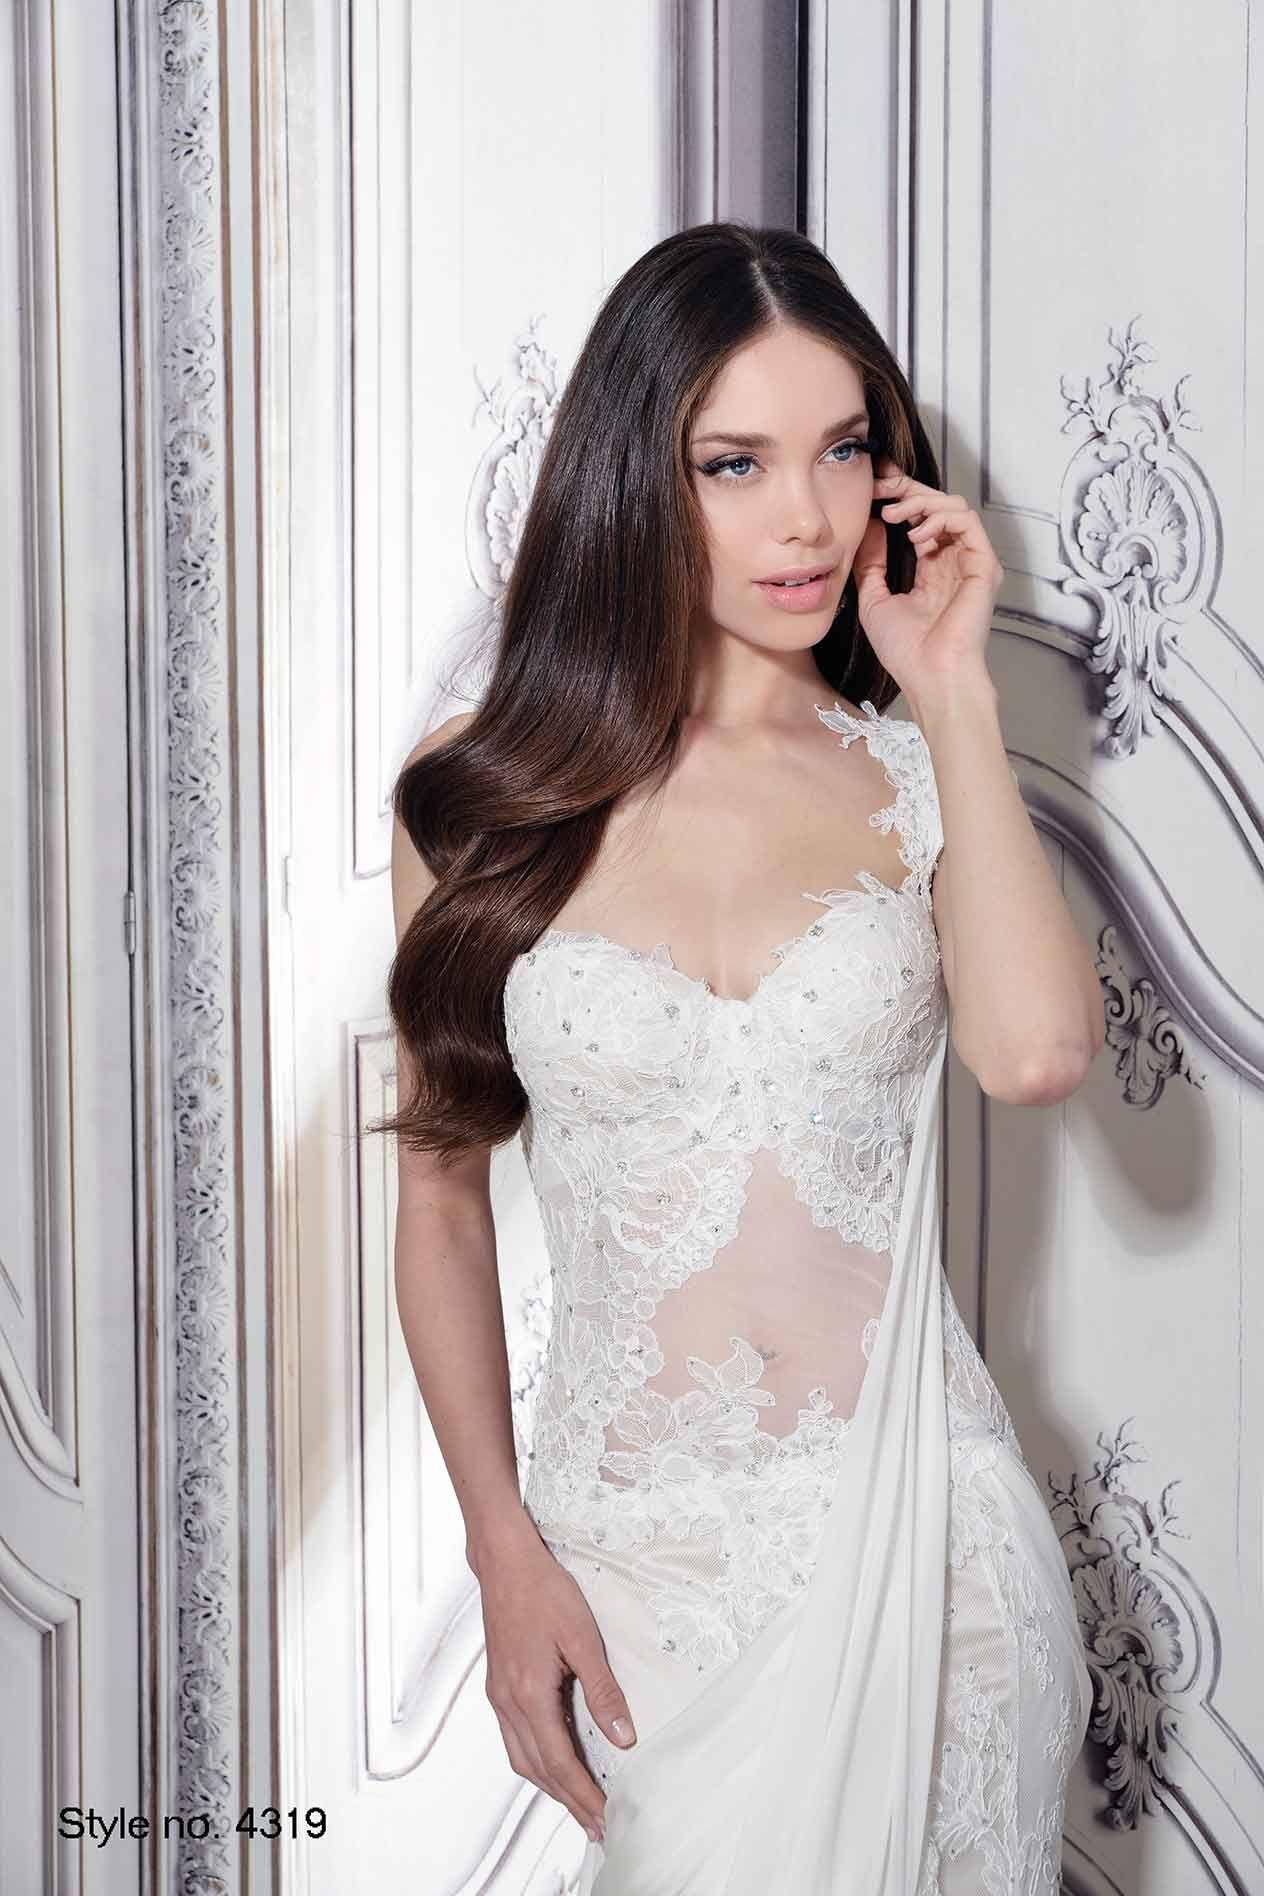 Style no dream wedding pinterest pnina tornai weddings